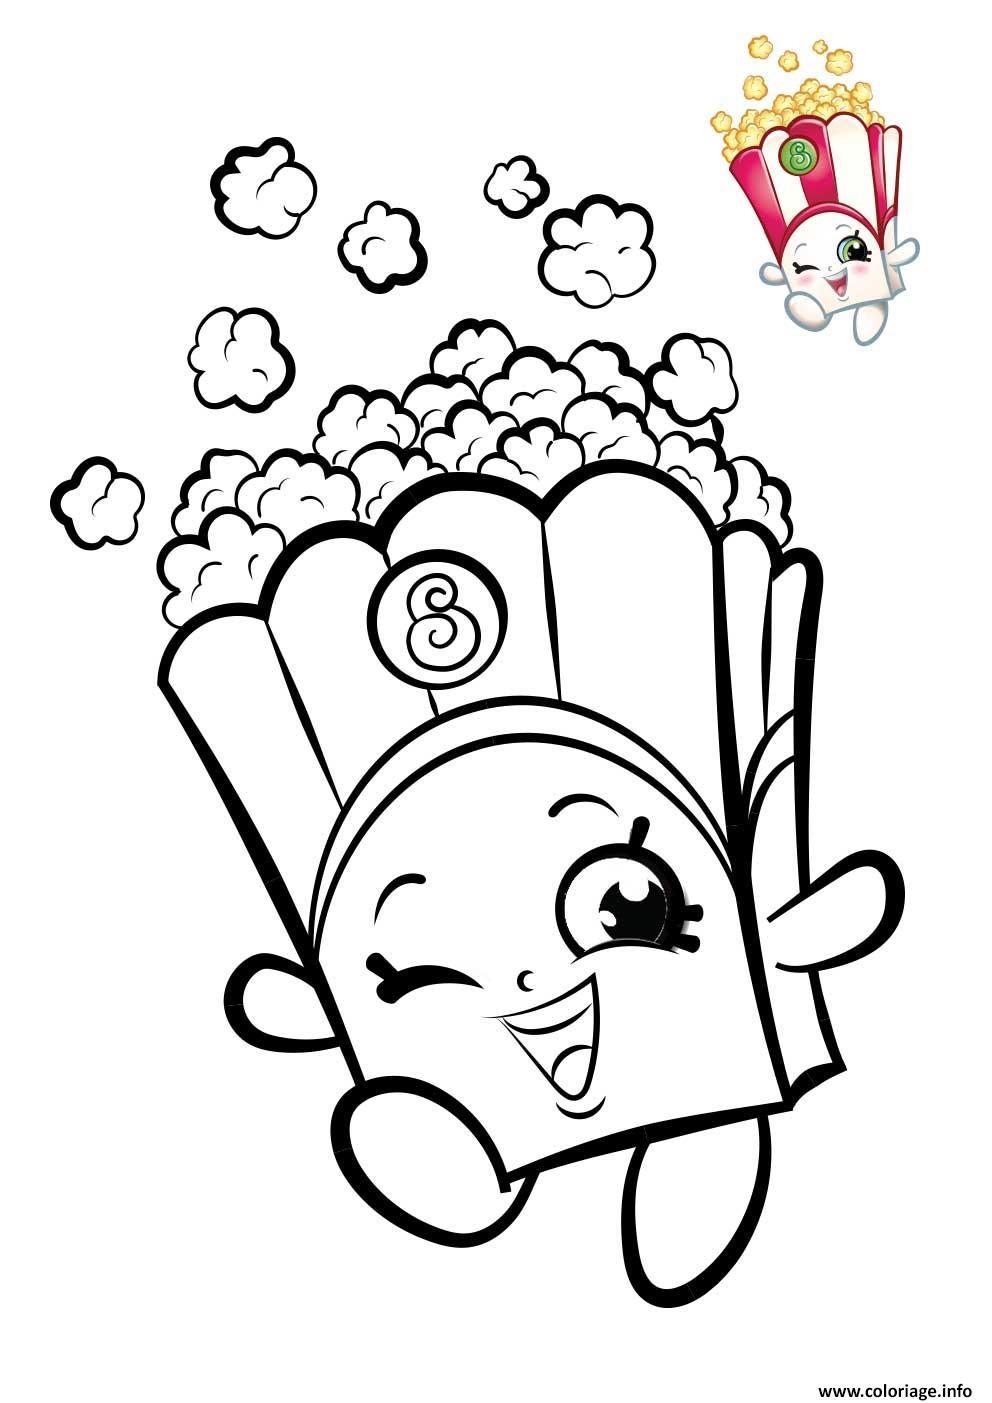 Coloriage shopkins popcorn dessin - Dessins a colorier gratuits a imprimer ...